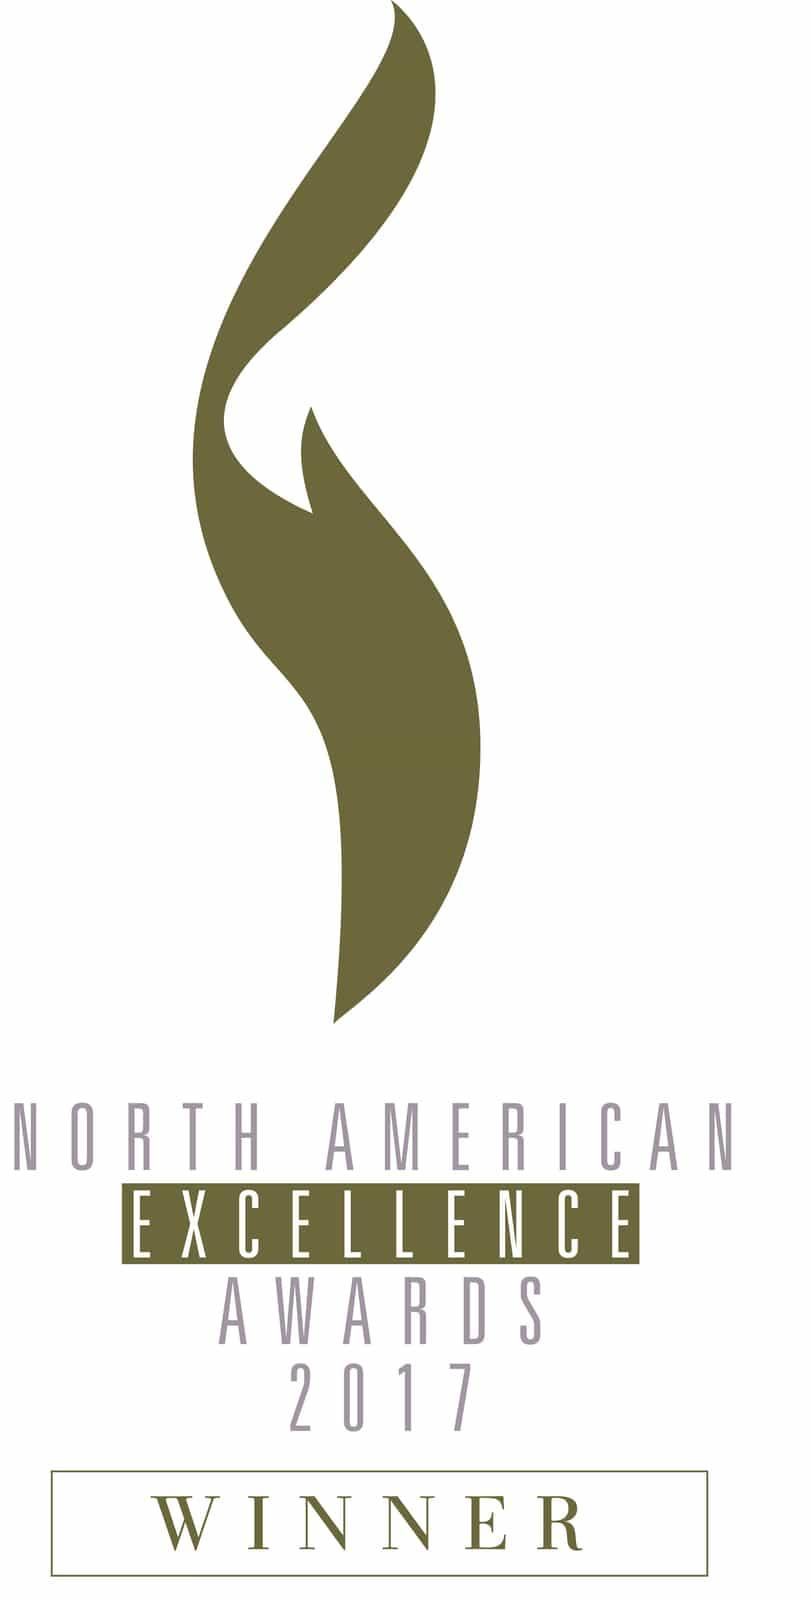 North-American_Winner_2017